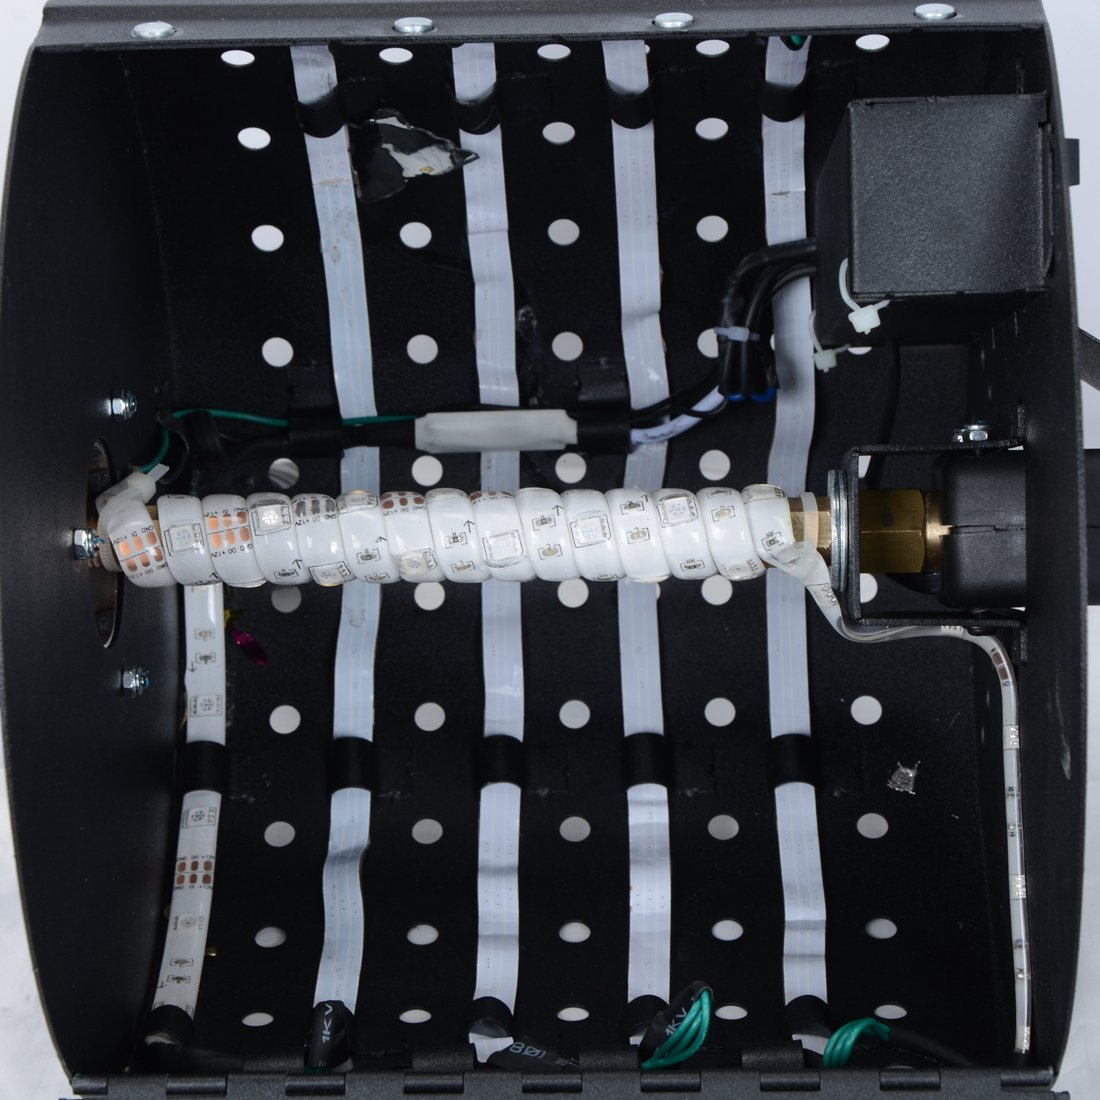 MOKA SFX LED Co2 Confetti Handheld Stage Effect Gun Shipping from USA for Wedding Club Nightclub Party by MOKA SFX (Image #8)